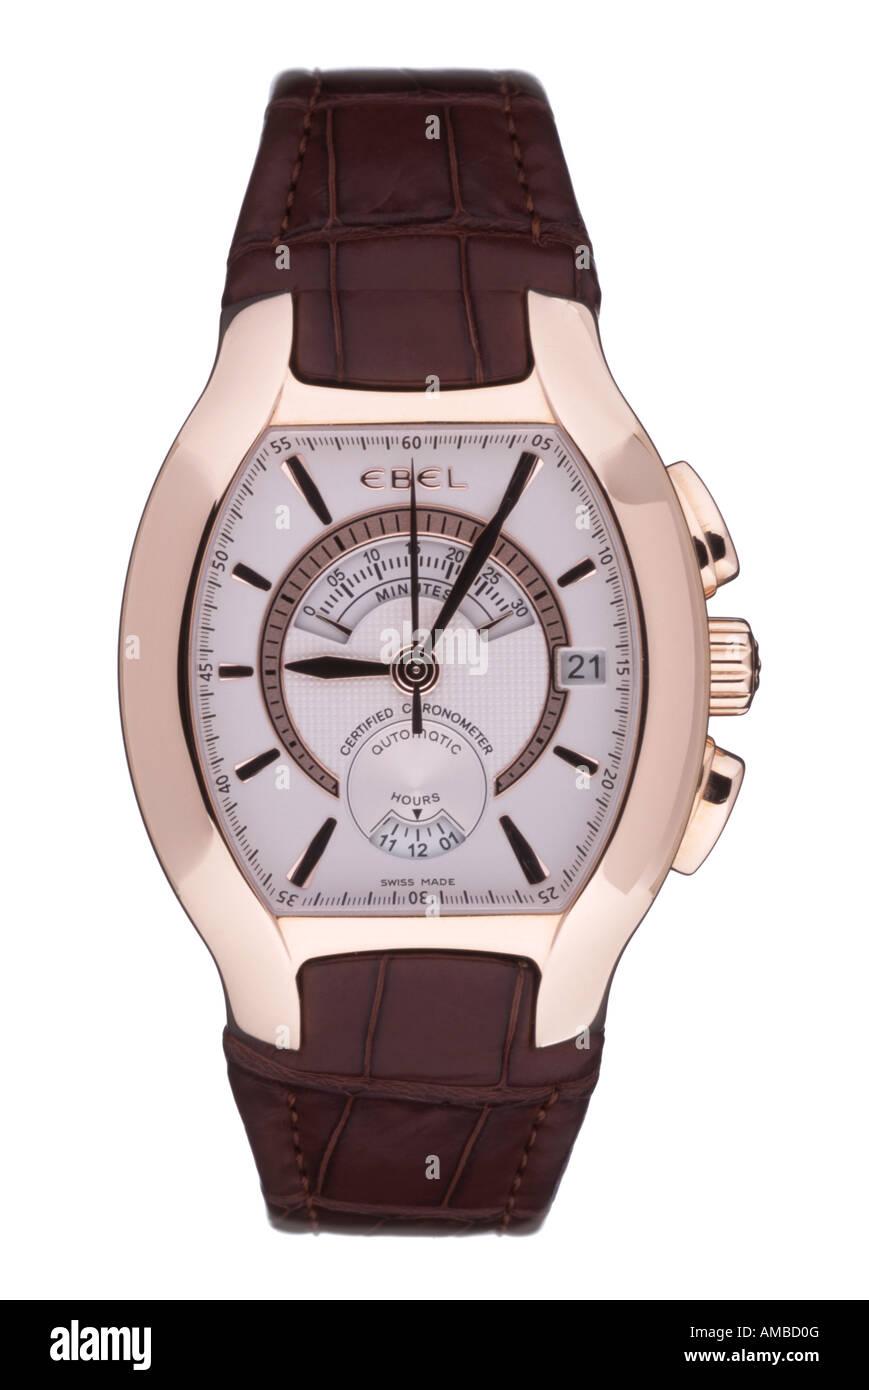 Ebel wristwatch - Stock Image